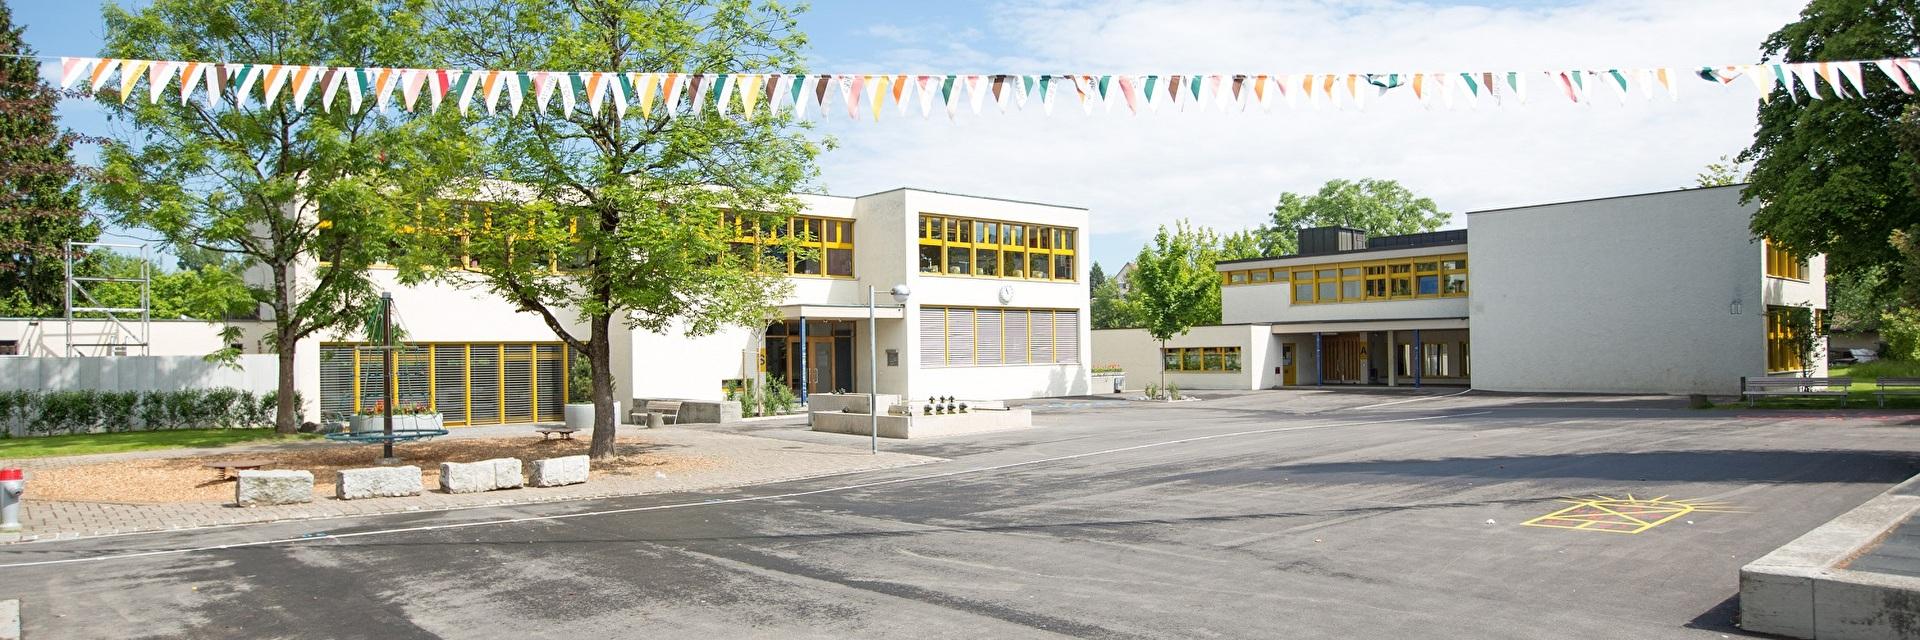 Schulhaus Mettlen